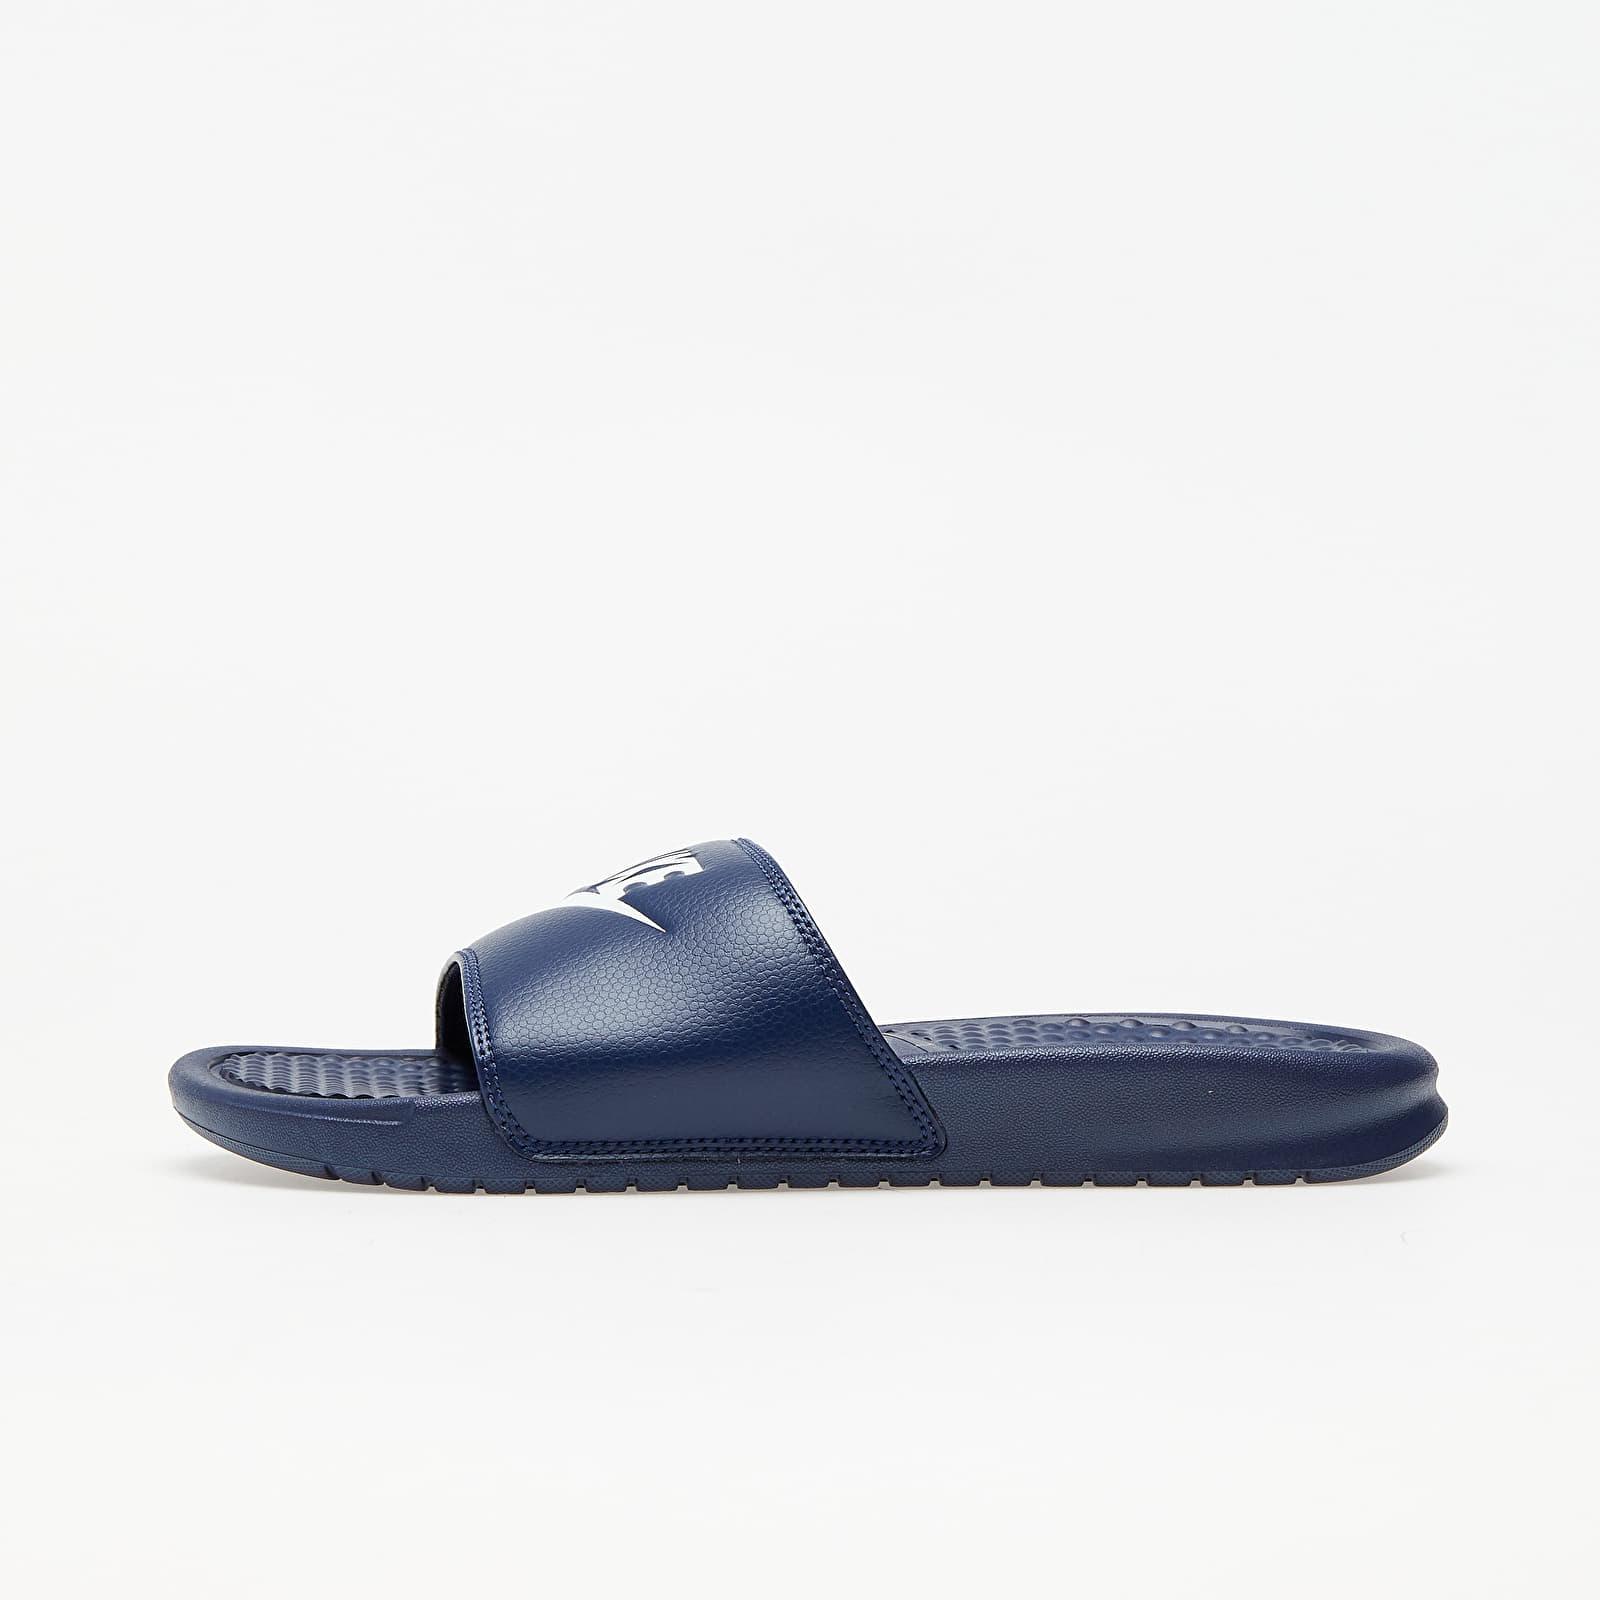 Nike Benassi Jdi Midnight Navy/ Windchill EUR 38.5